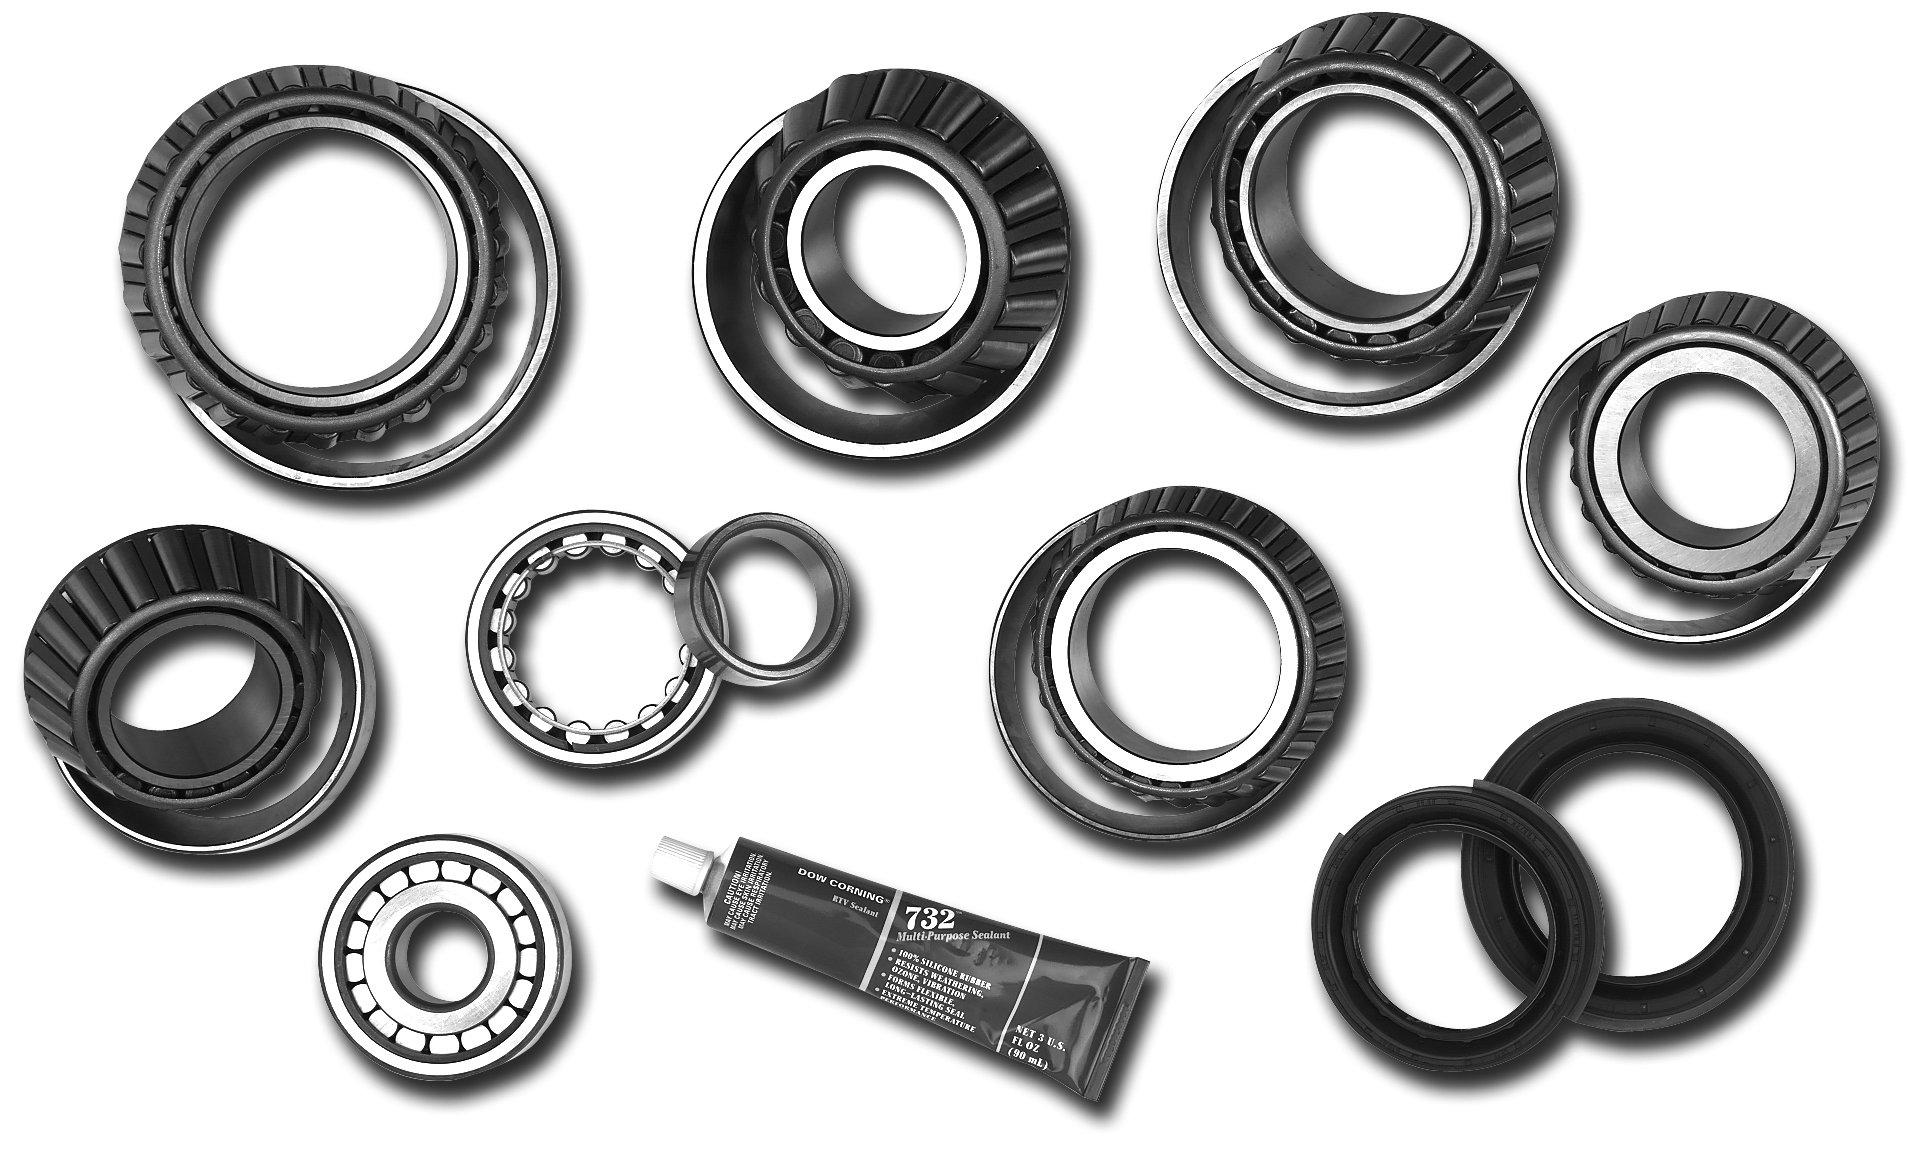 Dana Spicer 1043619 Axle Bearing Rebuild Kit for 97-99